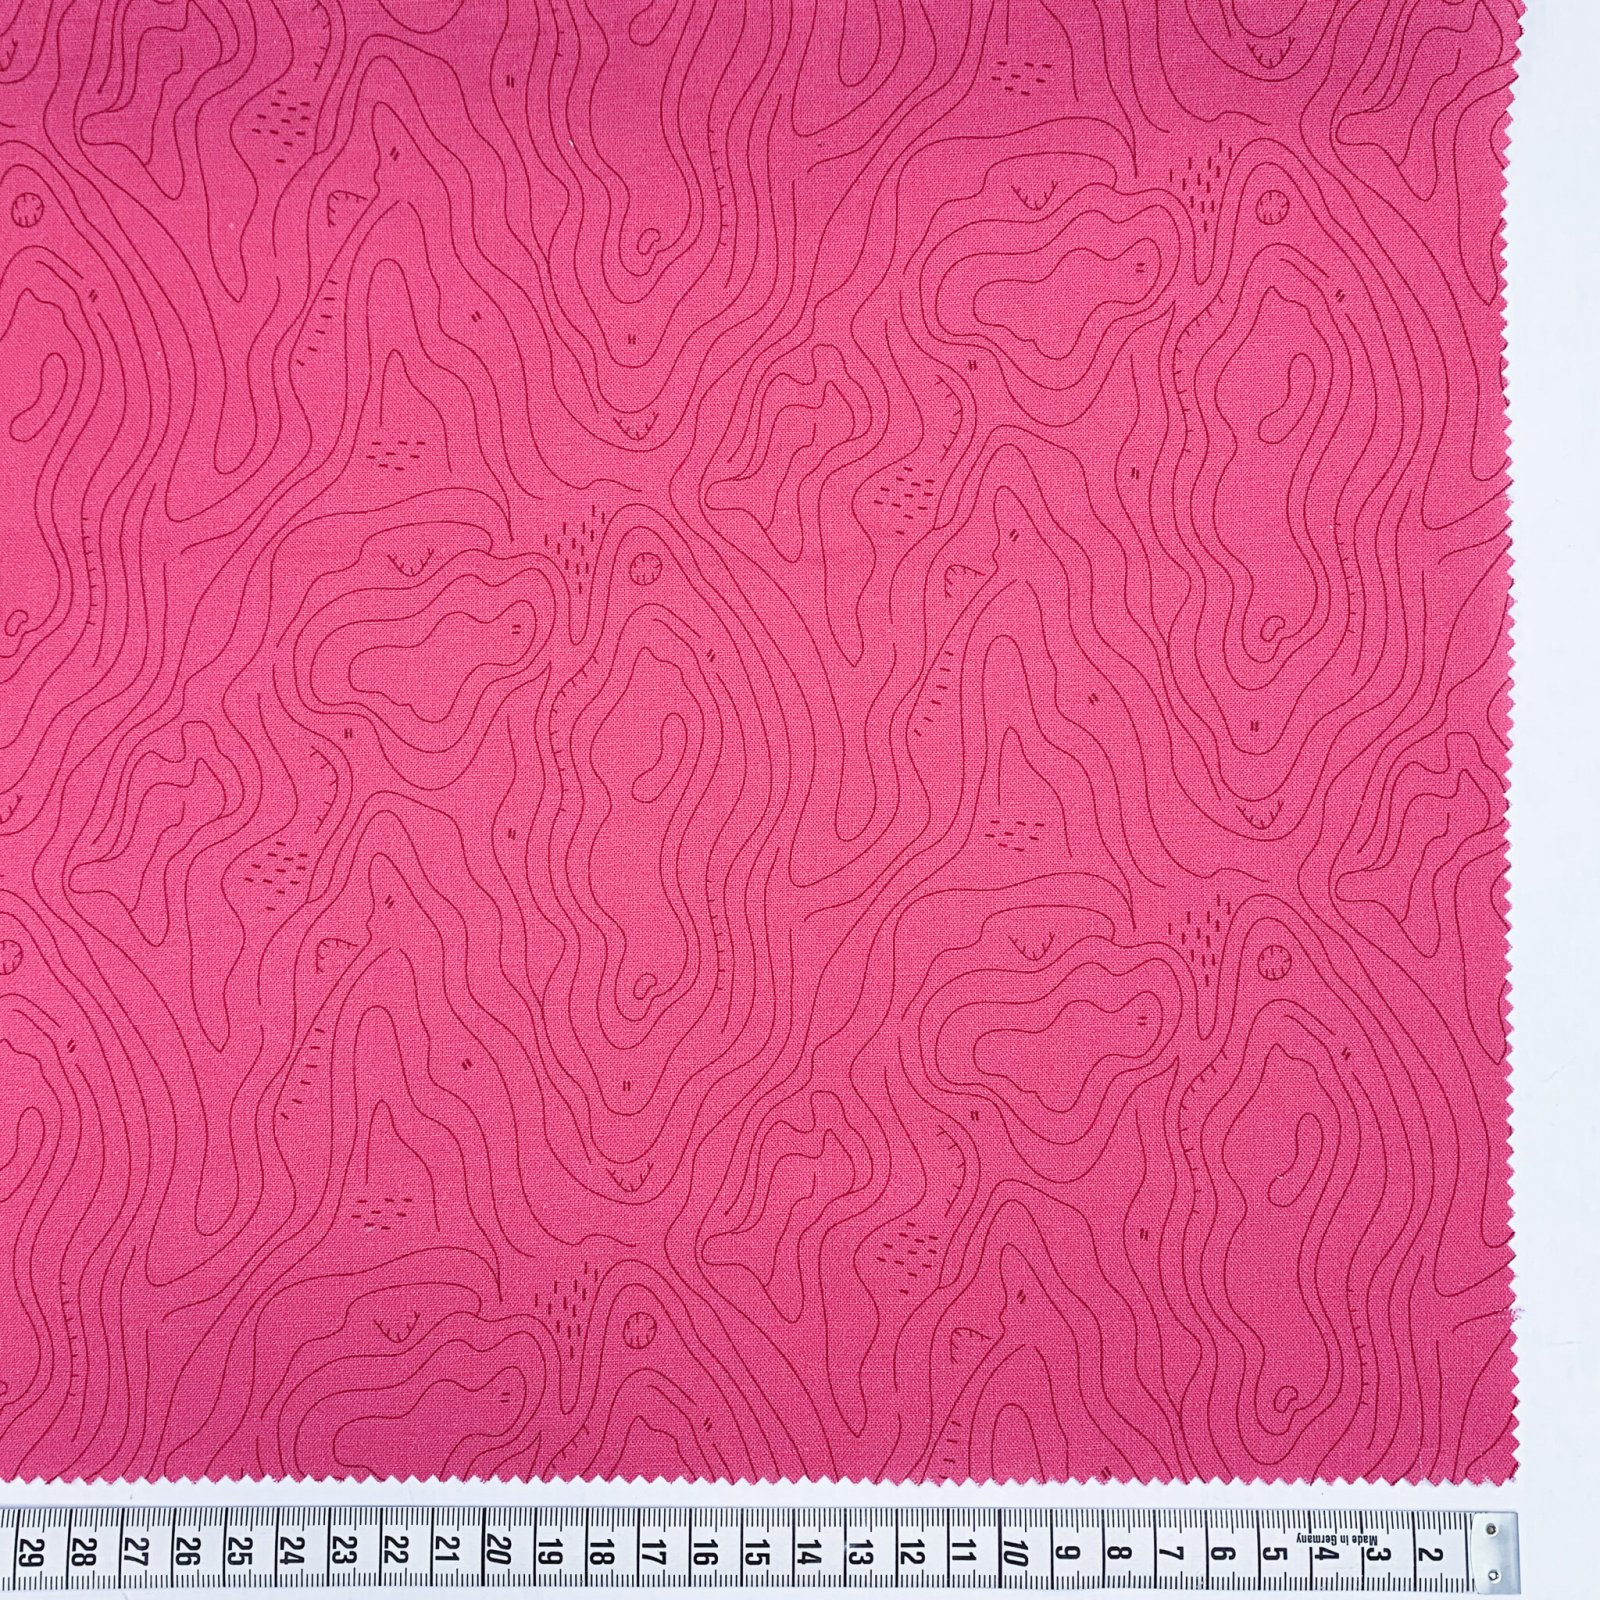 Spectrum - Squiggle - Pink